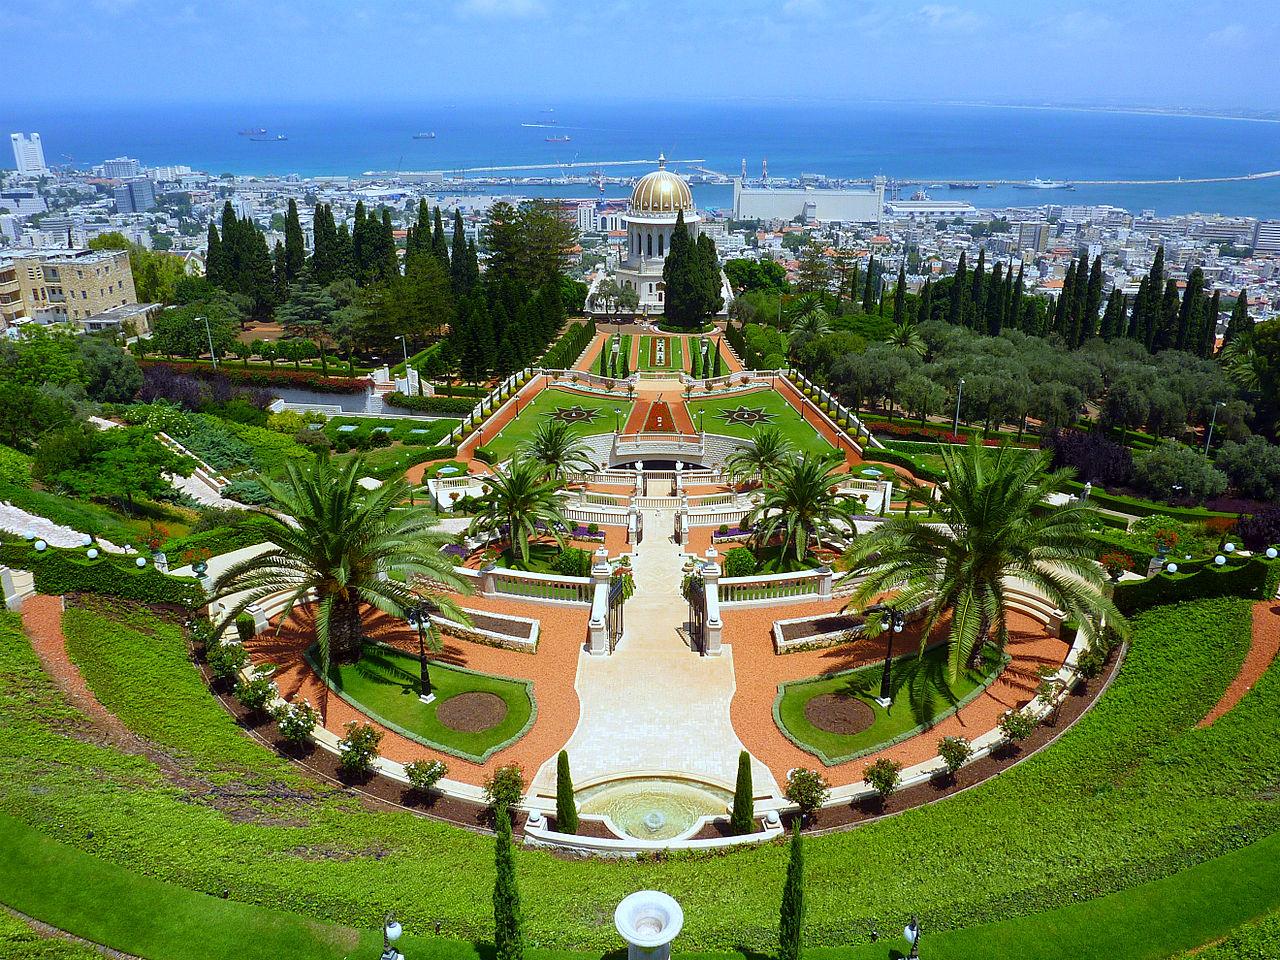 израиль: My Greatest World Destination: The Hanging Gardens Of